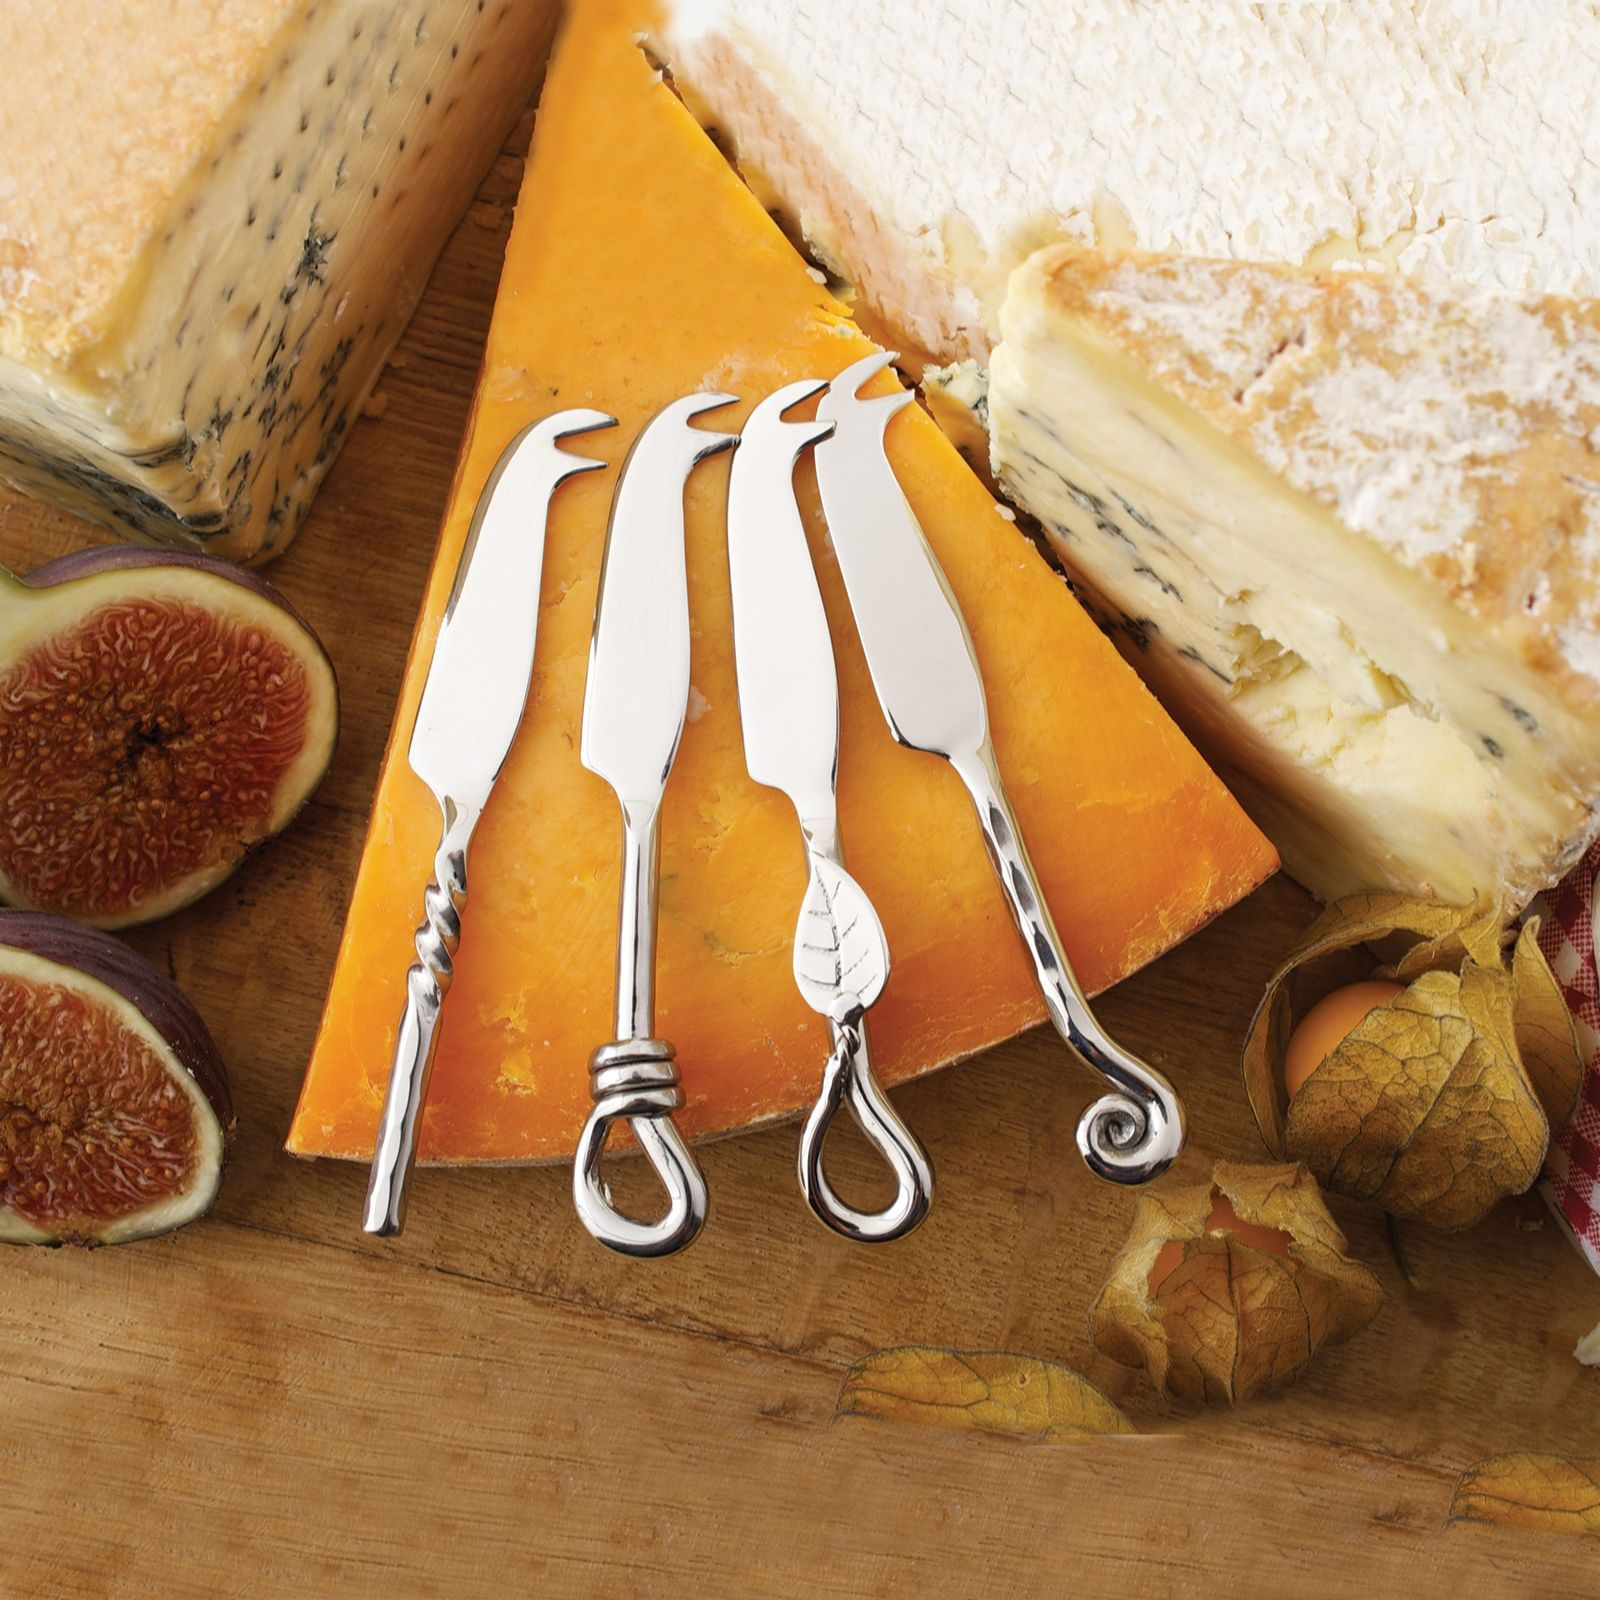 Culinary Concepts Set Of 4 Mini Coastal Cheese Knives Qvc Uk